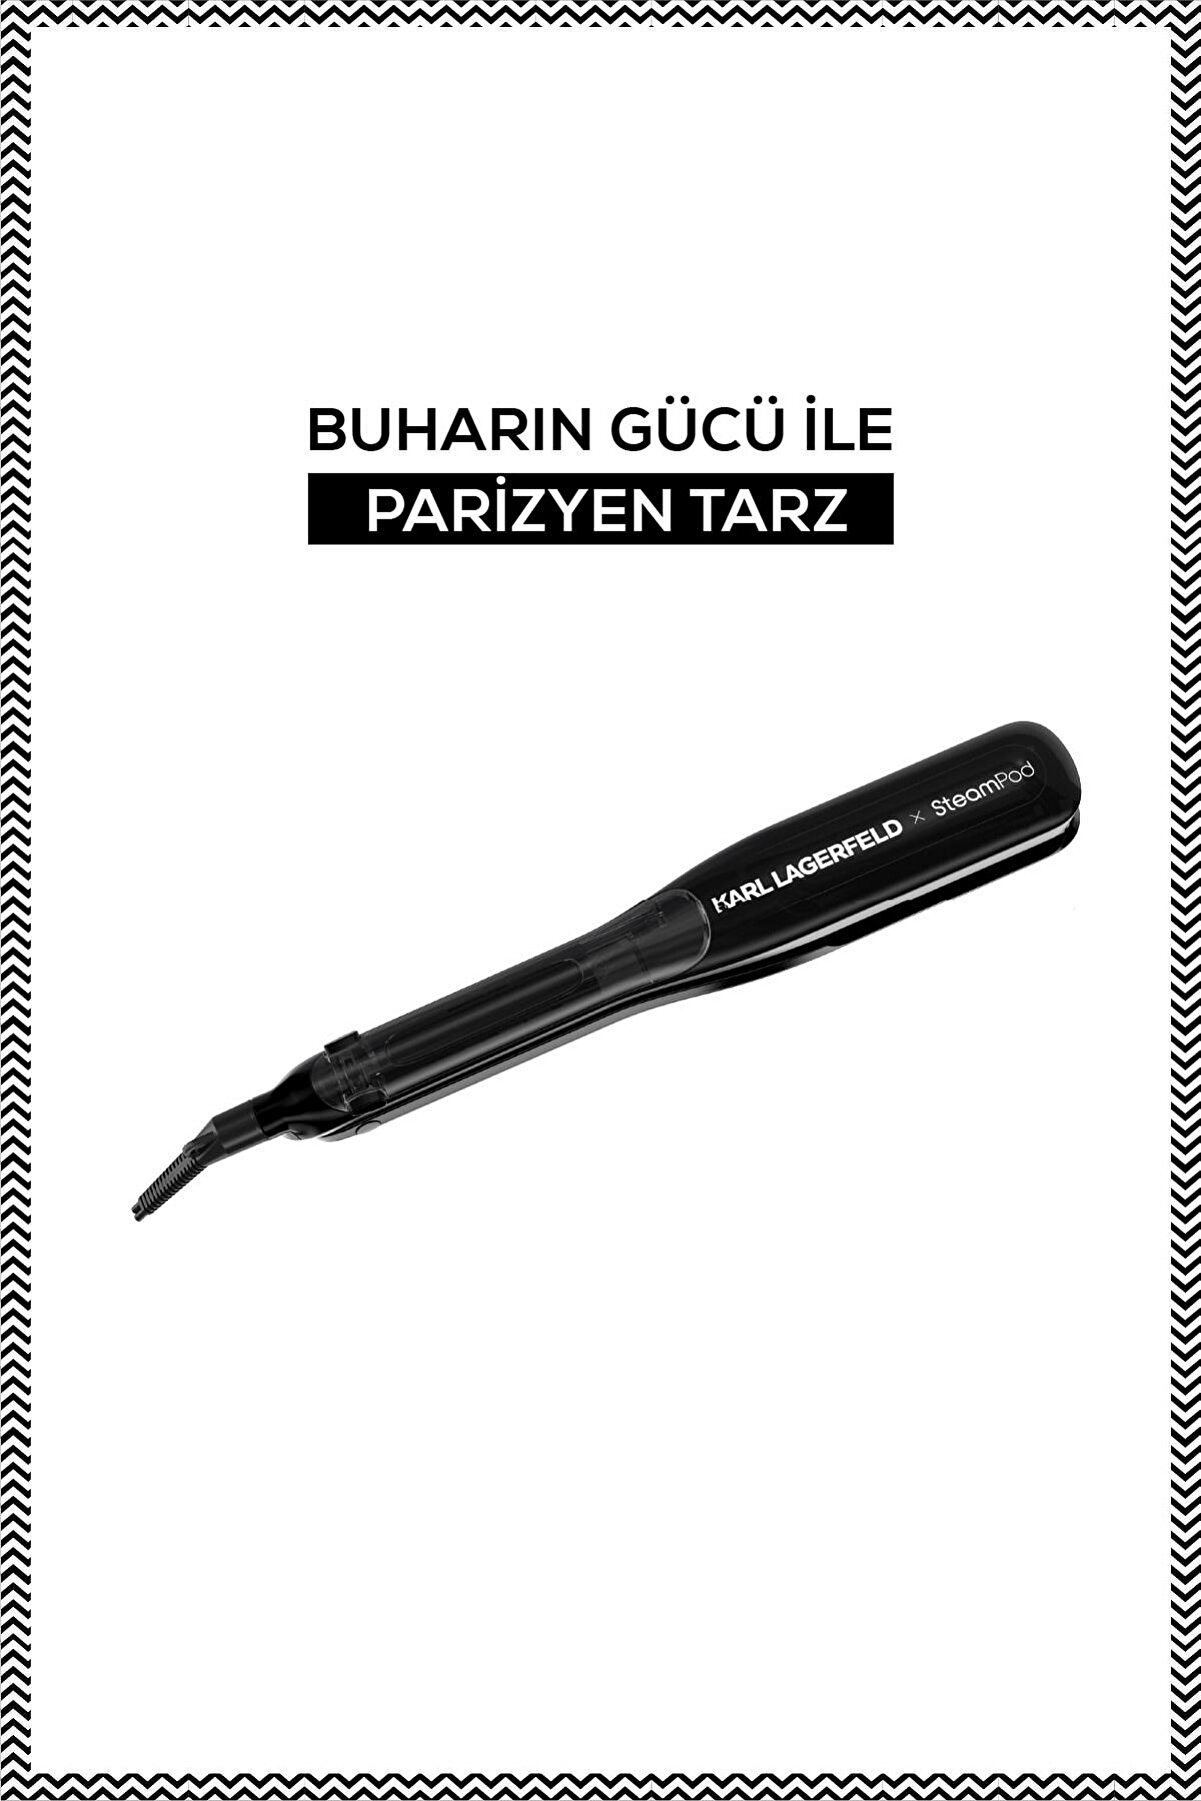 L'oreal Professionnel Steampod X Karl Lagerfeld 3.0 Limited Edition Buharlı Saç Şekillendiricisi